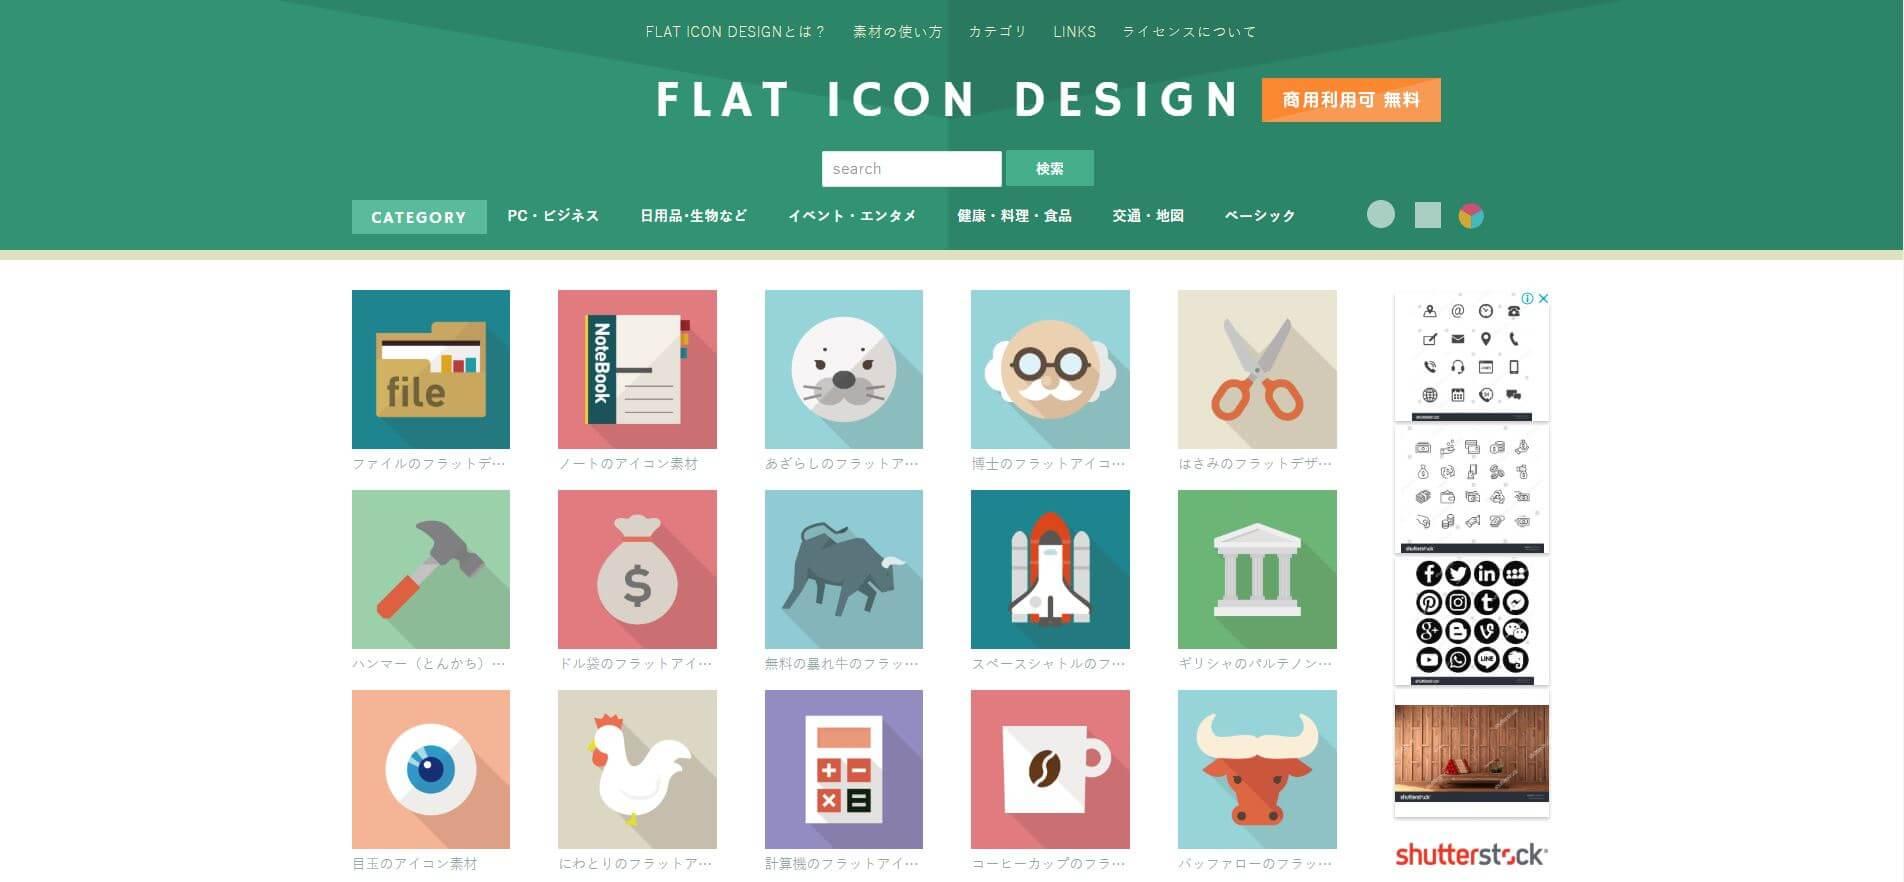 FLAT ICON DESIGNのトップページ